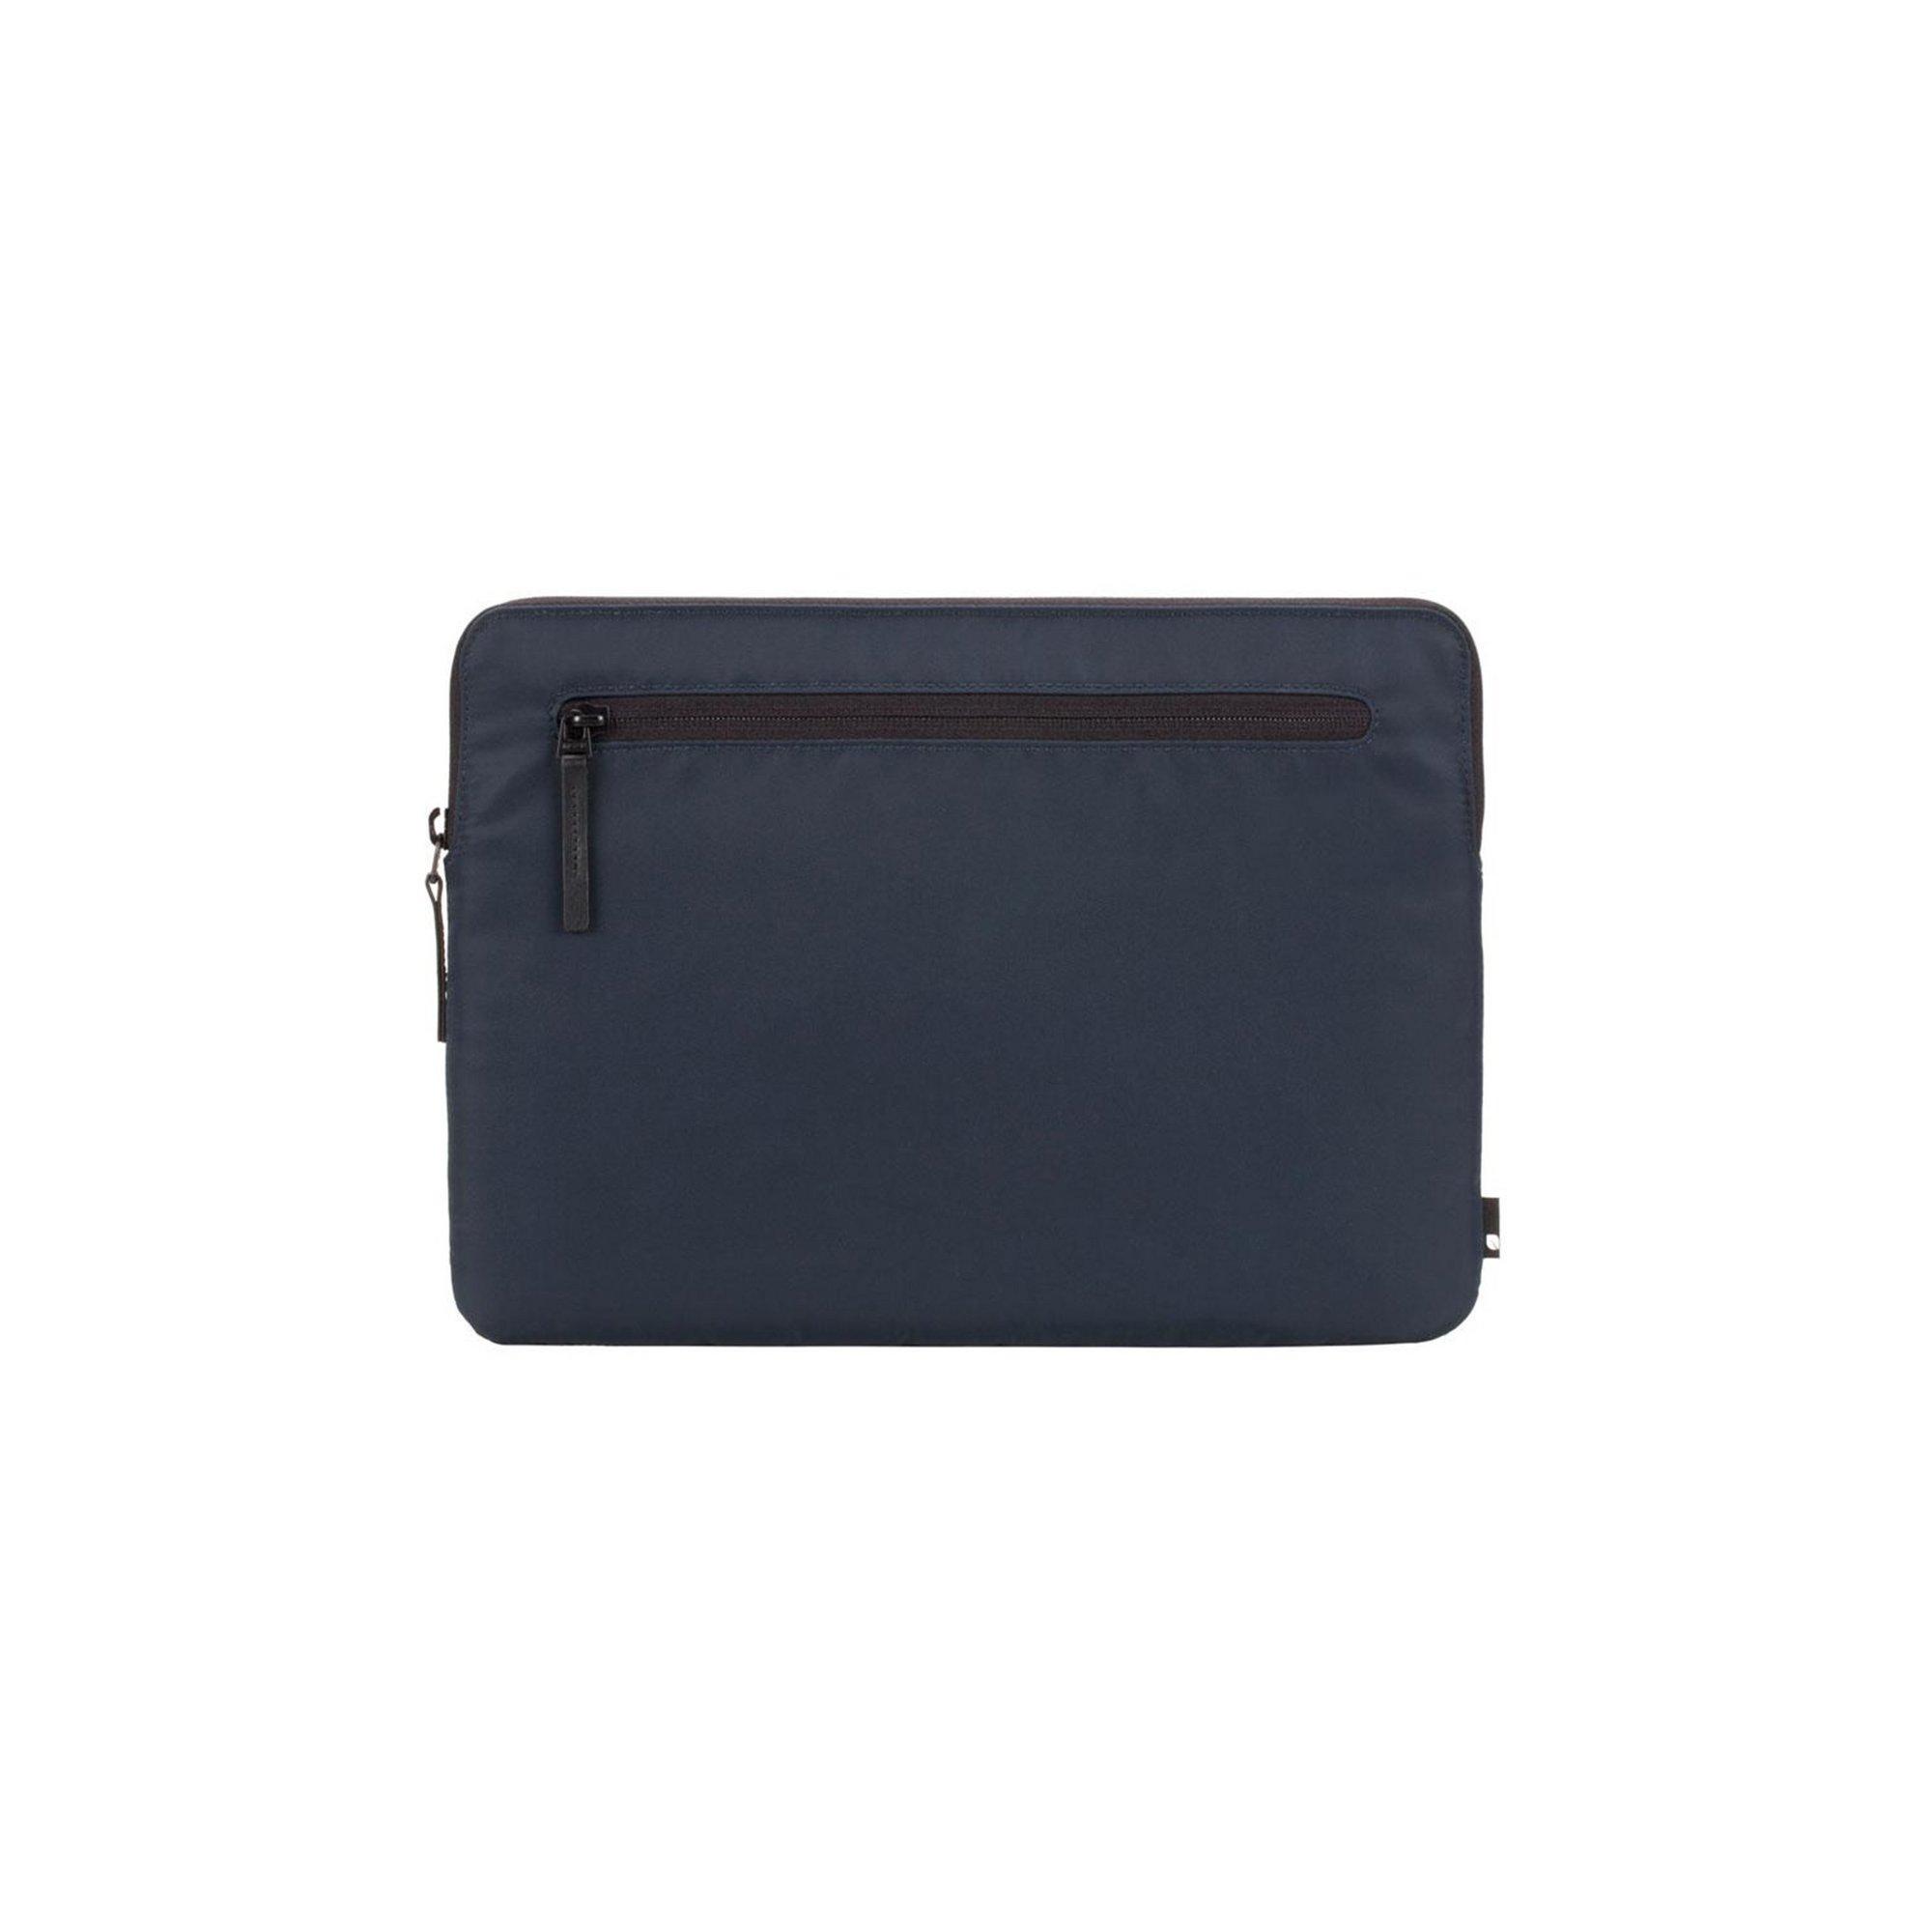 Image of Incase Compact 13.3 Inch Navy MacBook Pro Sleeve